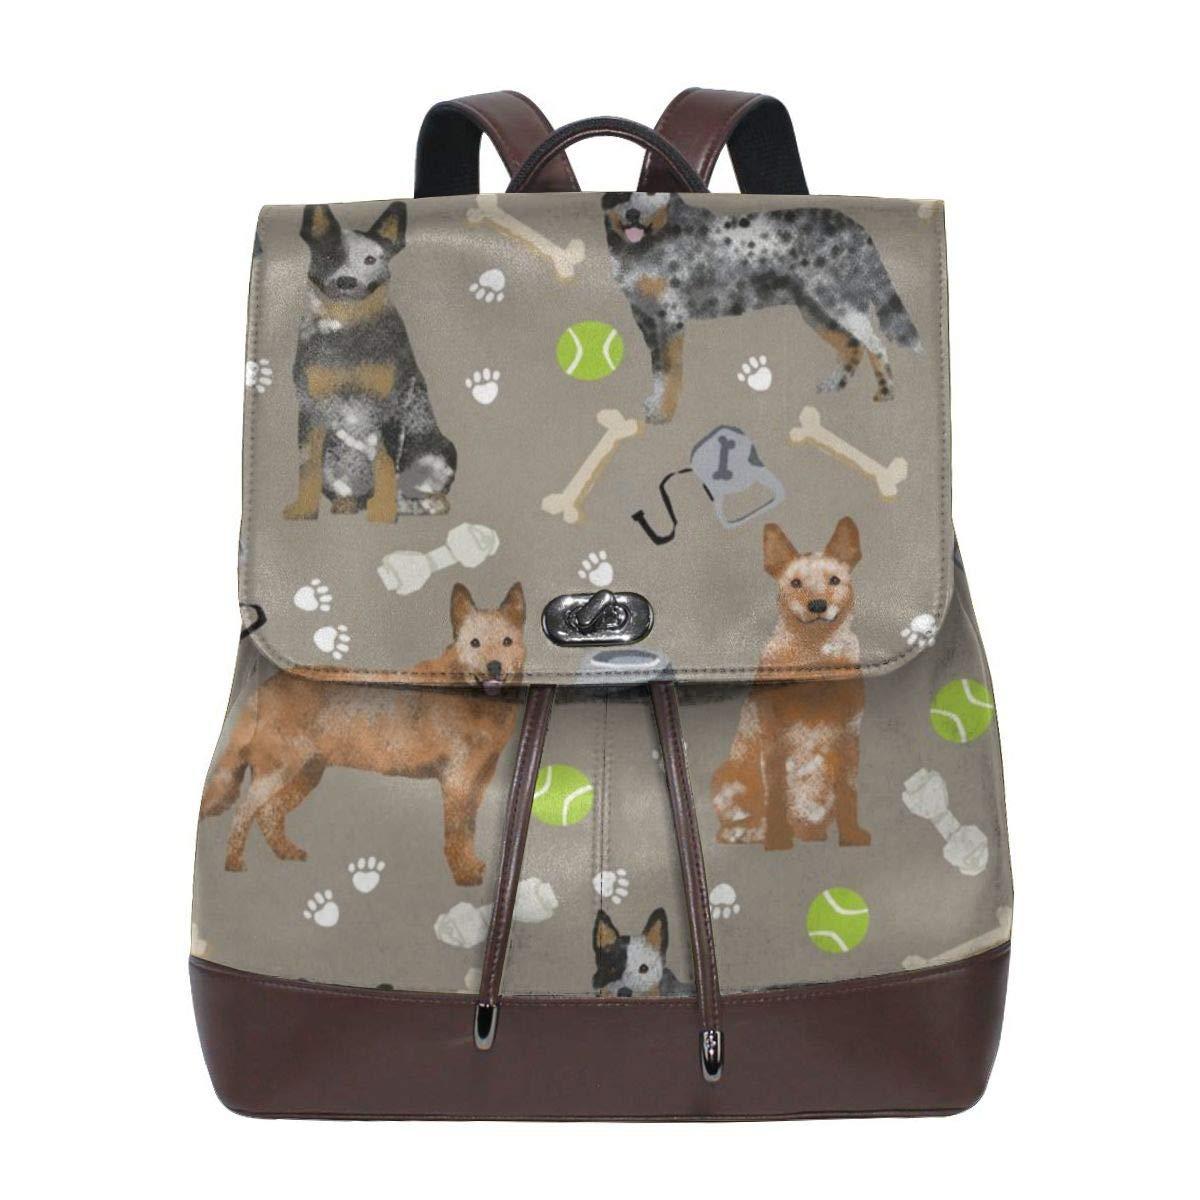 la red entera más baja Fashion Leather Backpack Australian Cattle Dog Dog Dog rojo Heelers Juguetes Medium marrón Purse Waterproof Anti Rucksack PU Leather Bags  suministro directo de los fabricantes